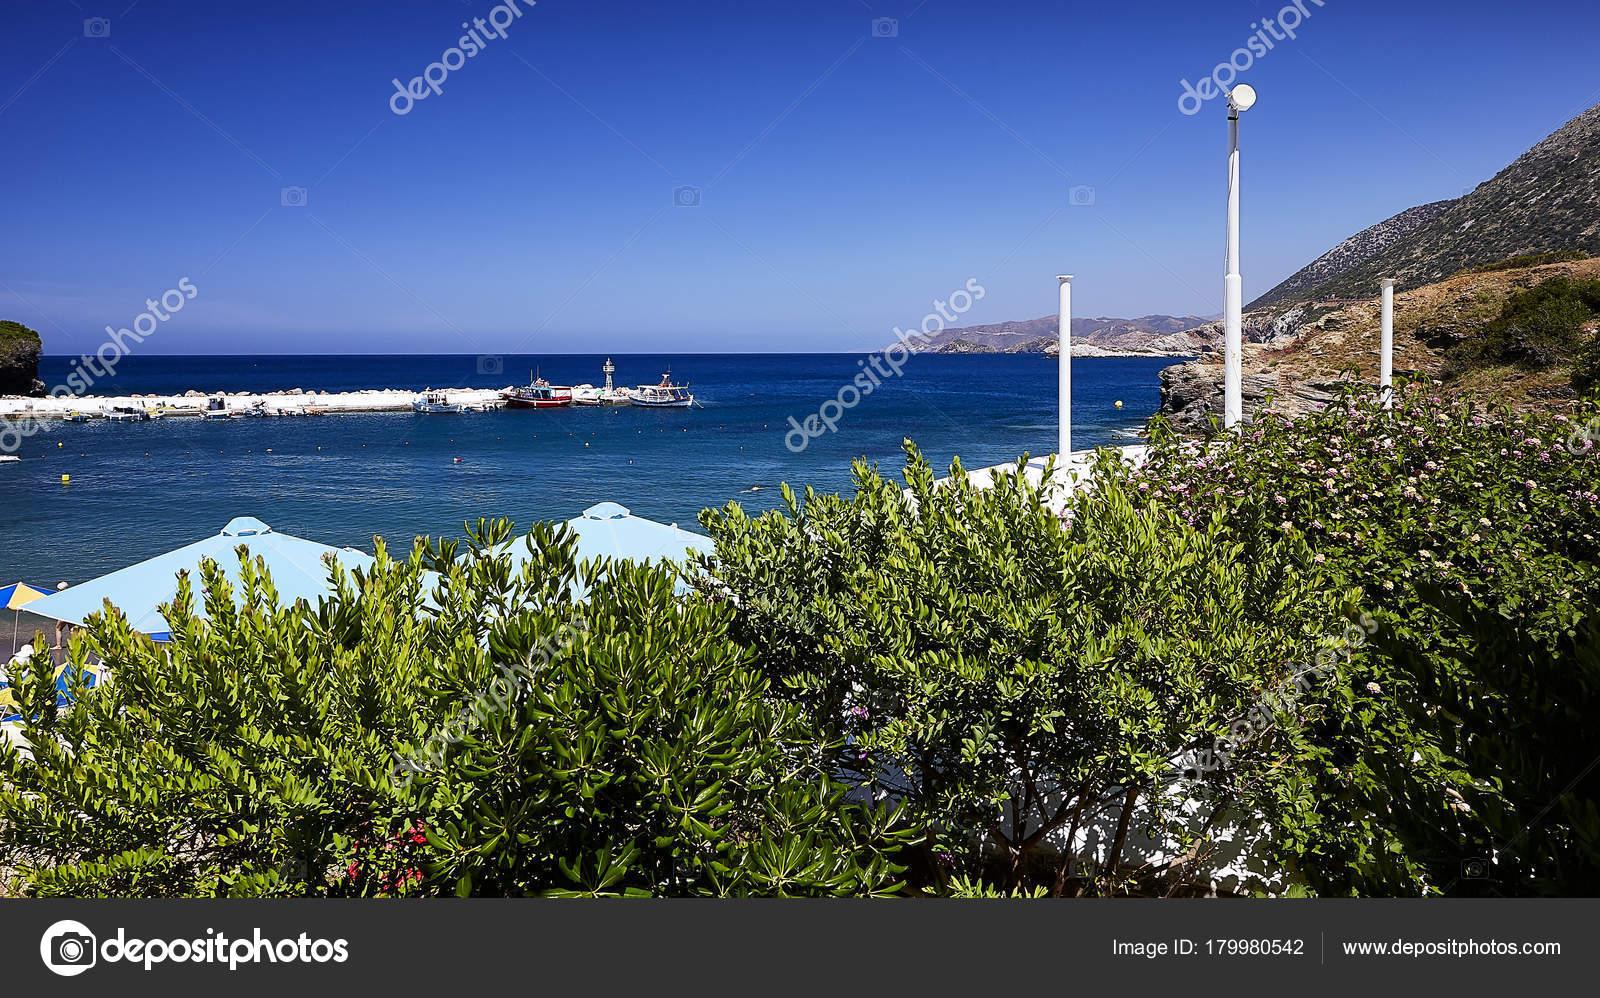 Seaview Bali Village Crete Island Greece Stock Photo C Helgapreiman 179980542